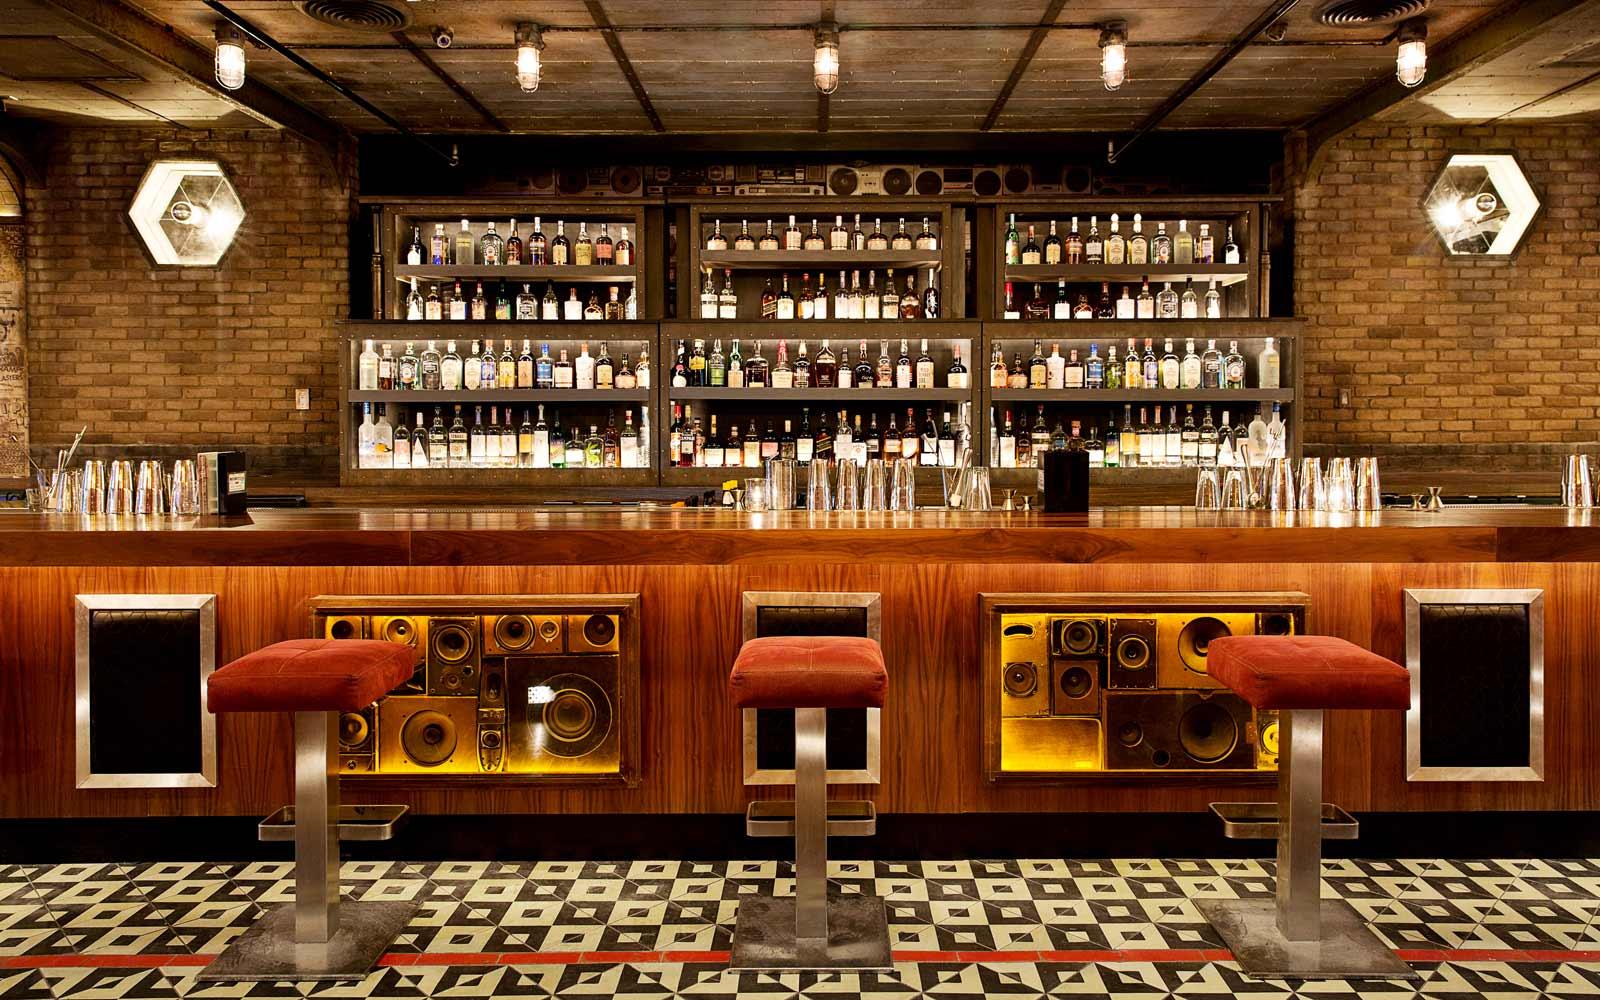 Break Room 86 Bar